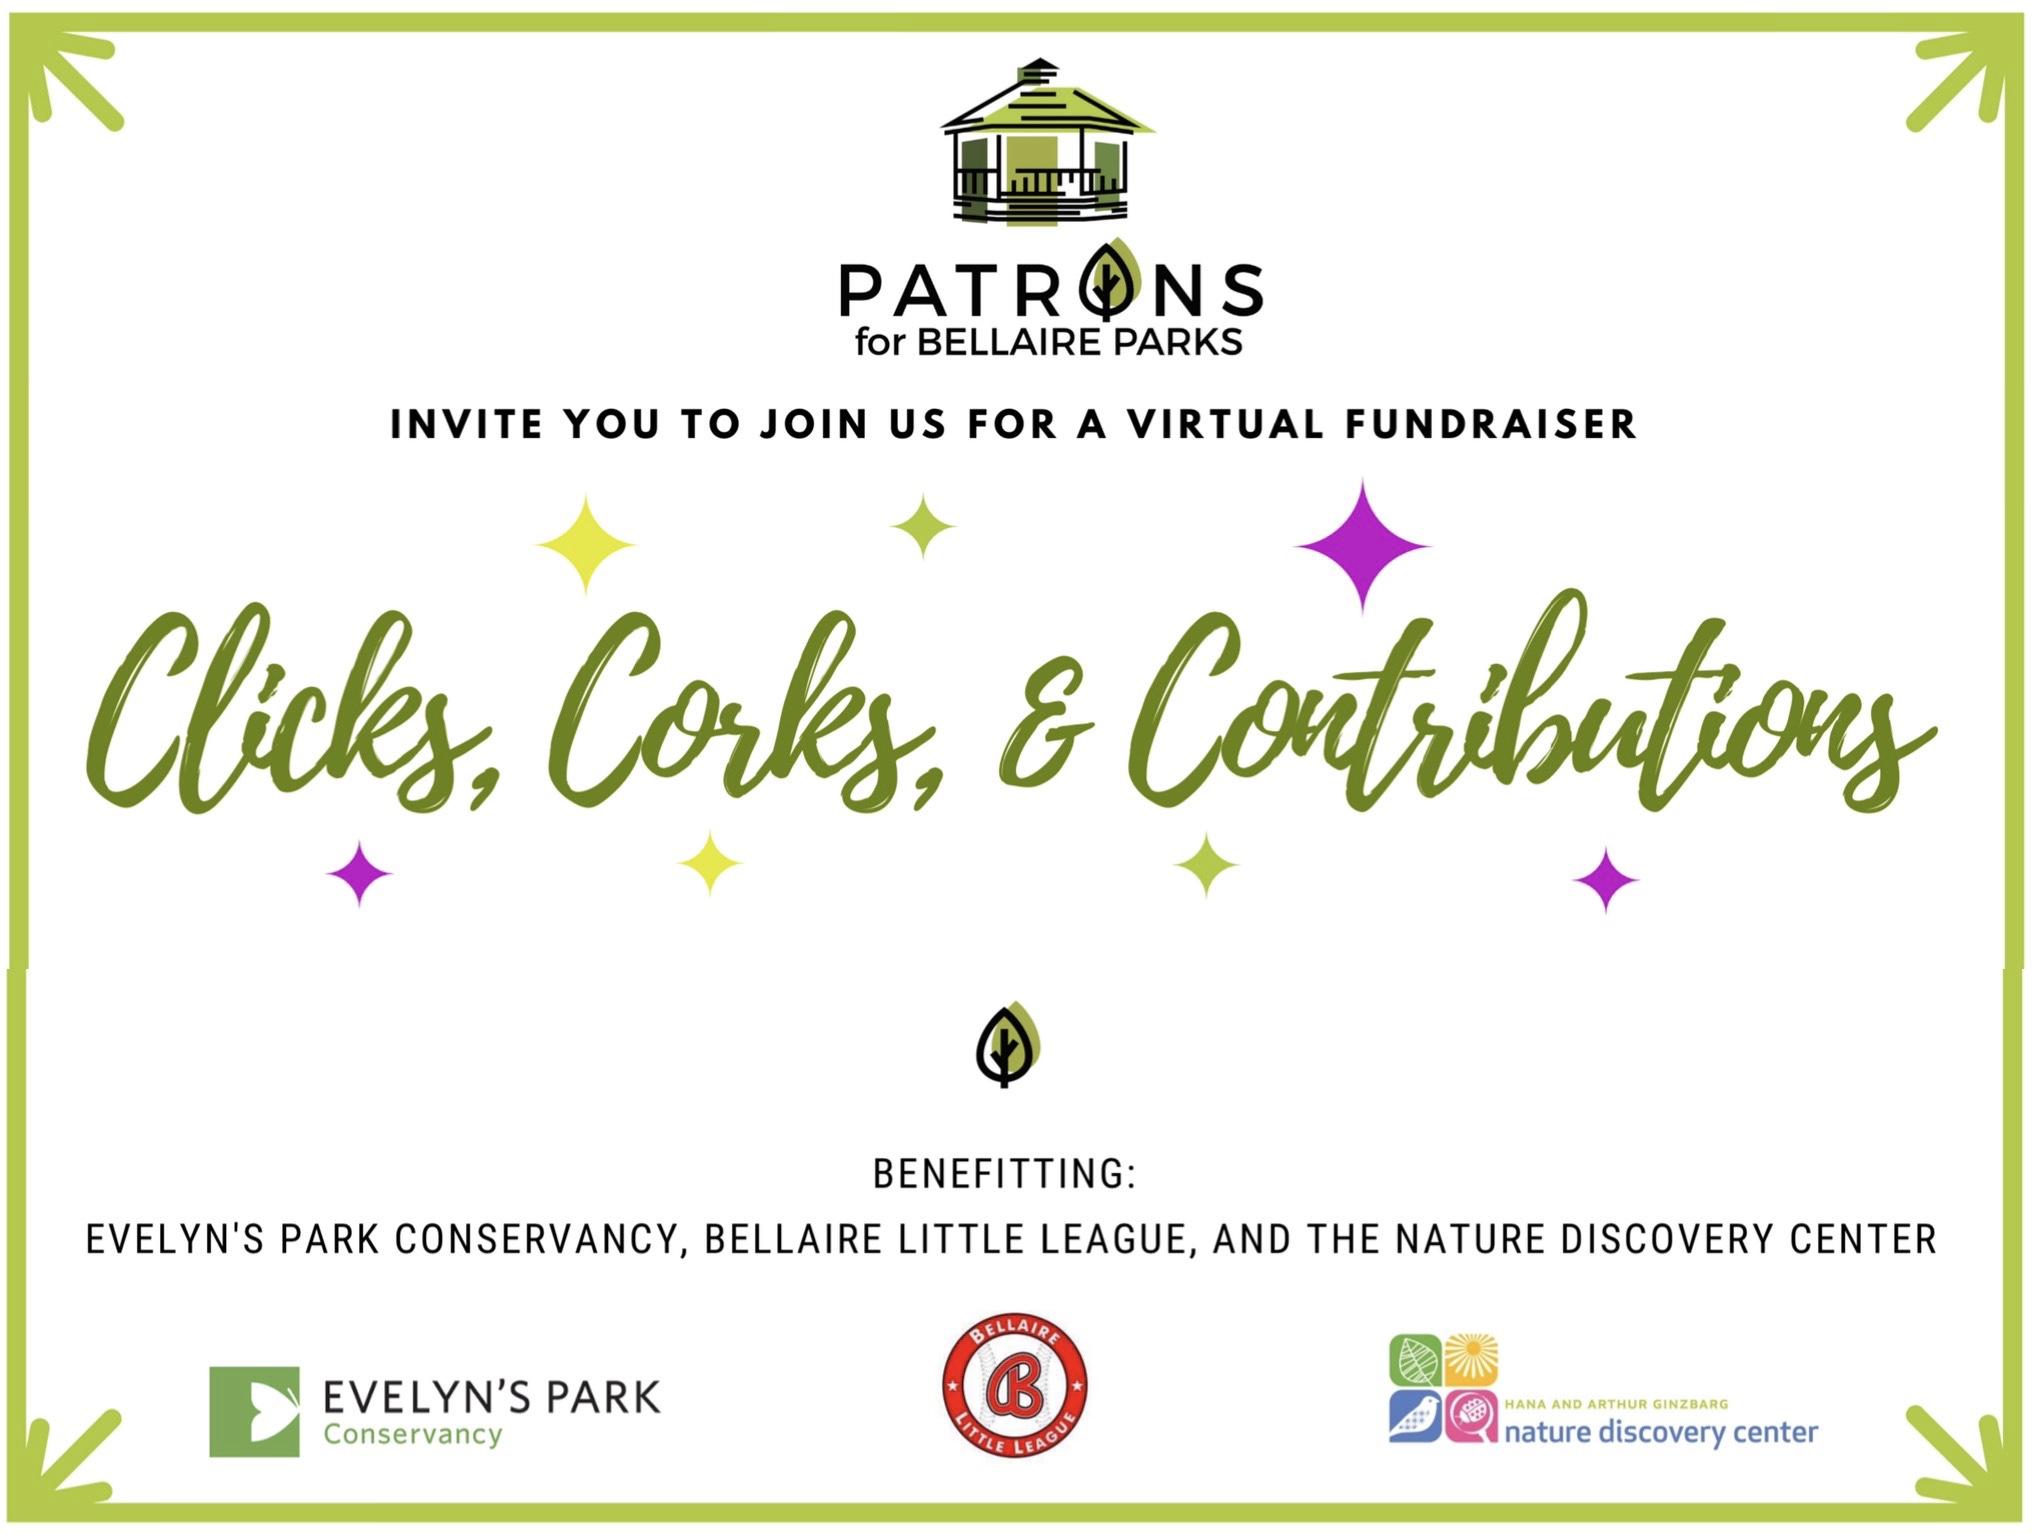 Clicks & Corks: Bellaire parks Patrons launch virtual fundraising gala